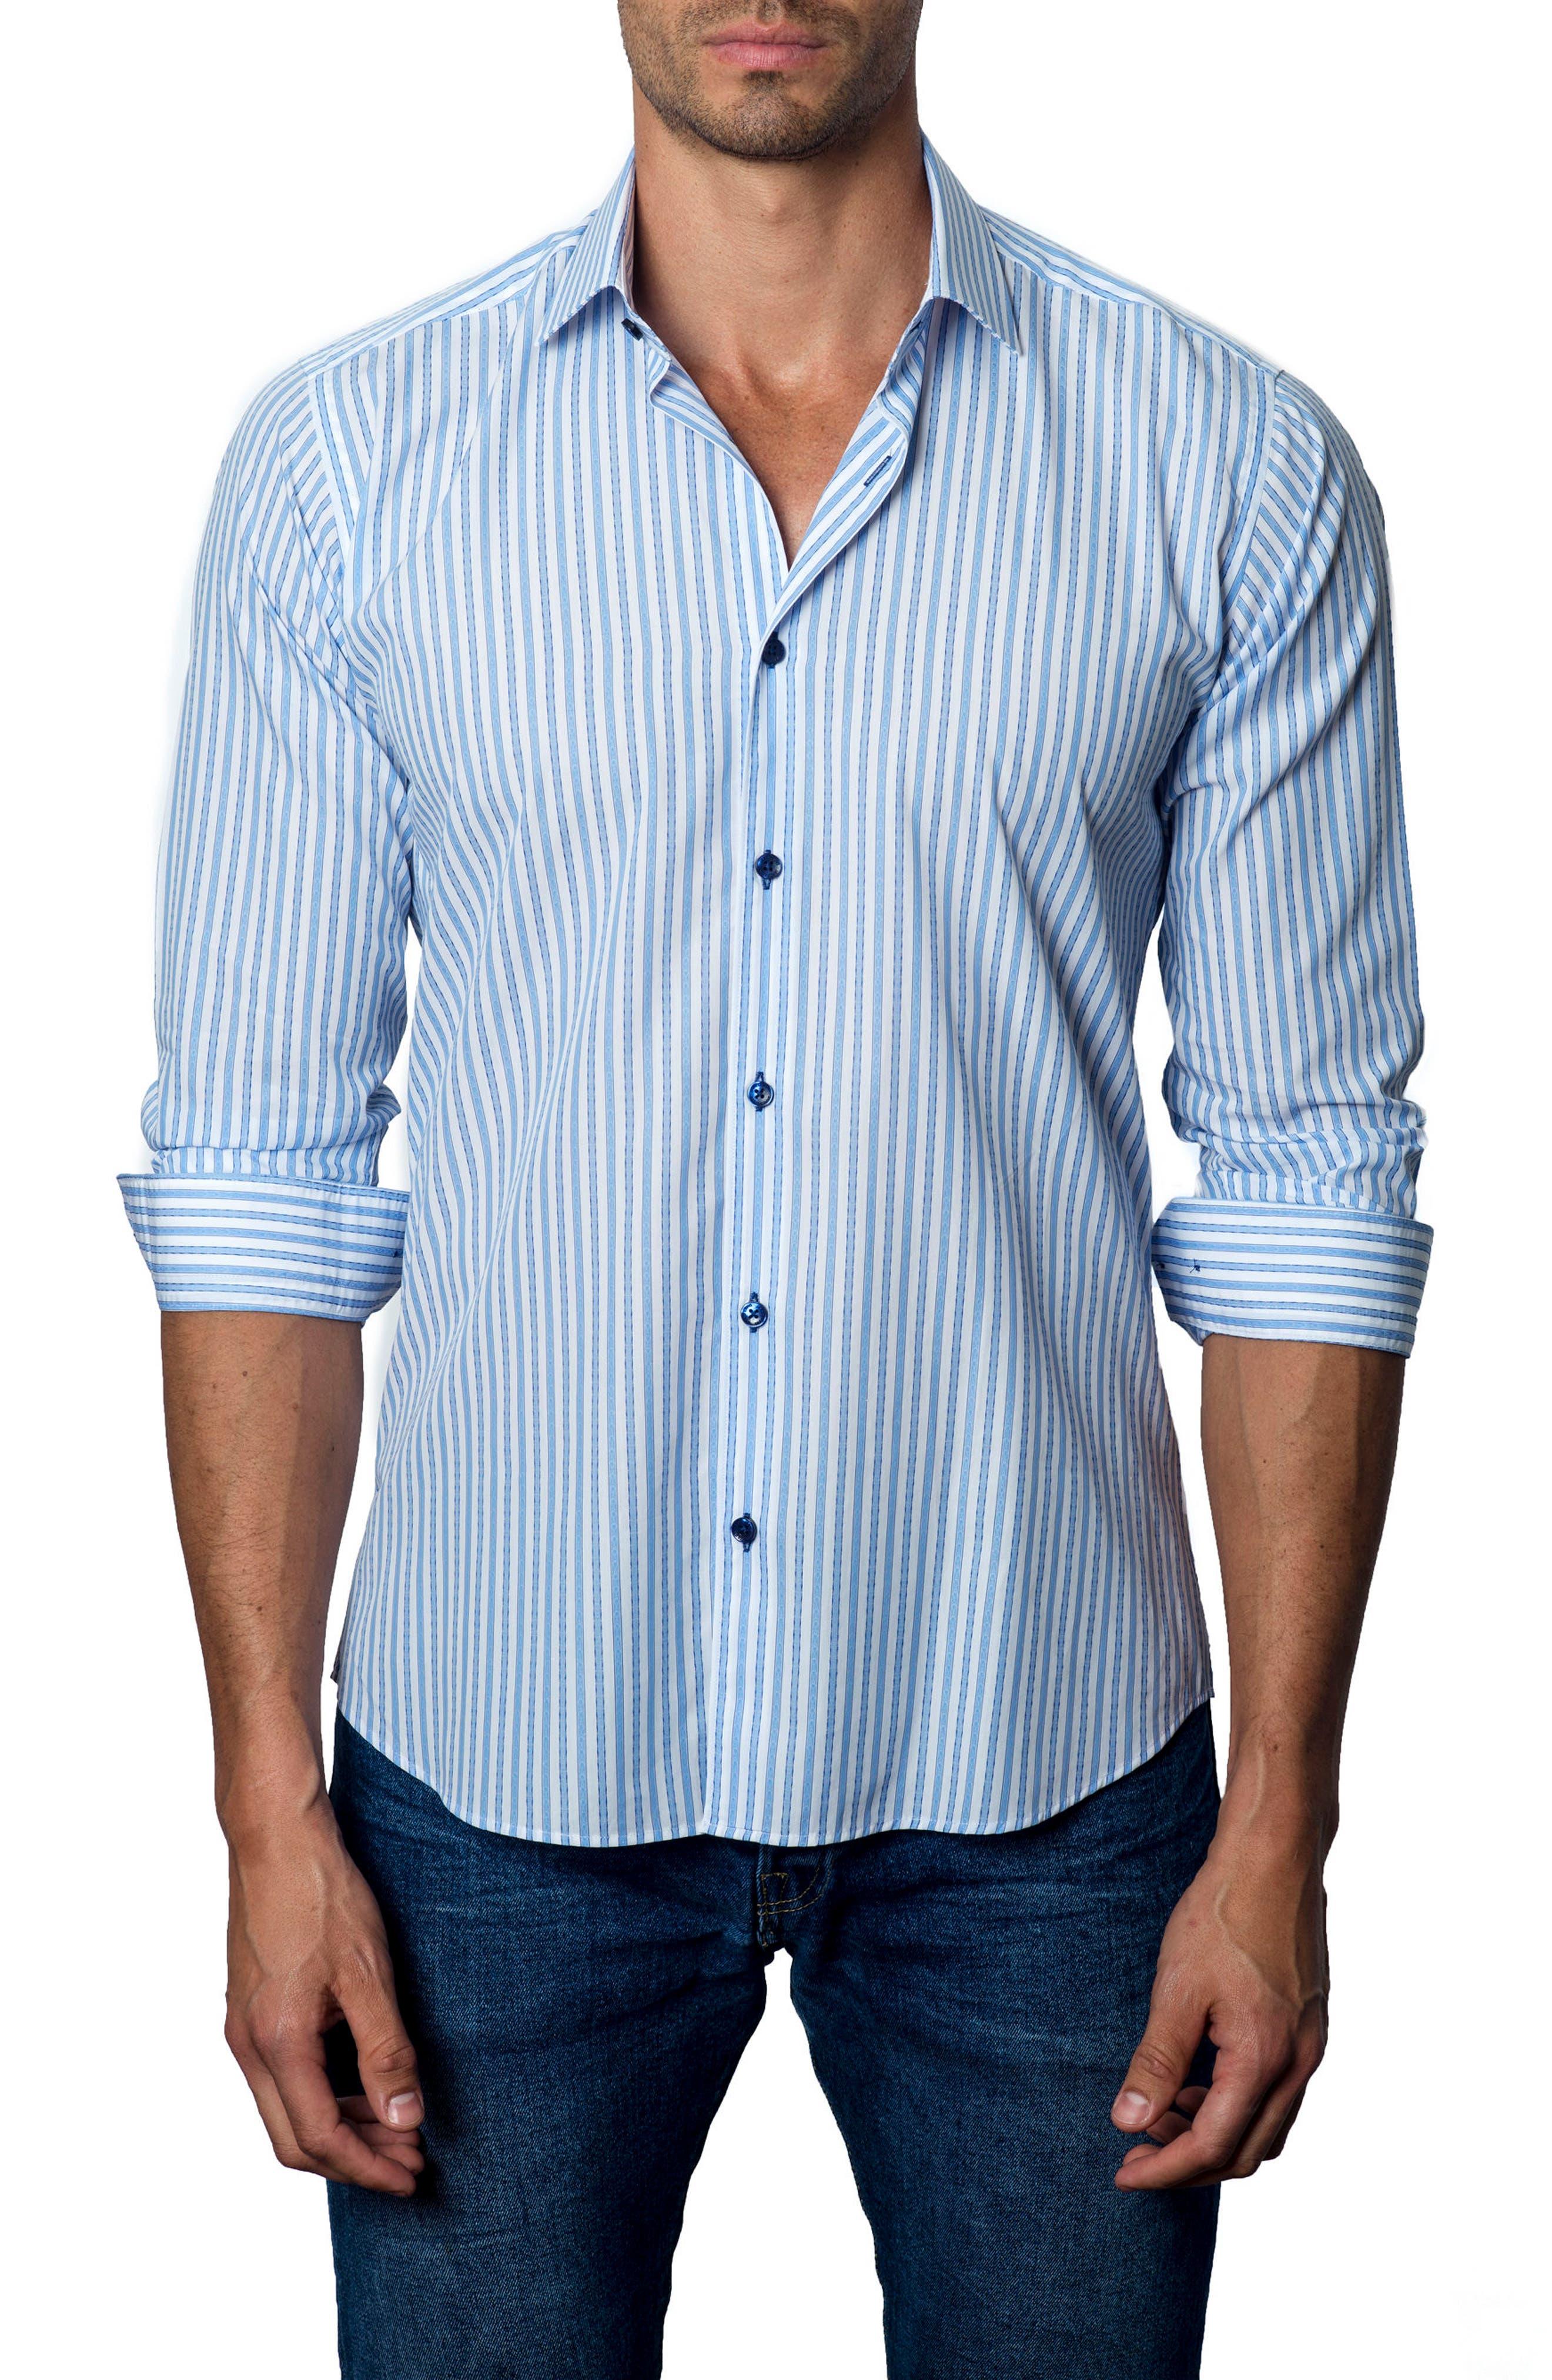 Trim Fit Stripe Sport Shirt,                         Main,                         color, Light Blue / White Stripe